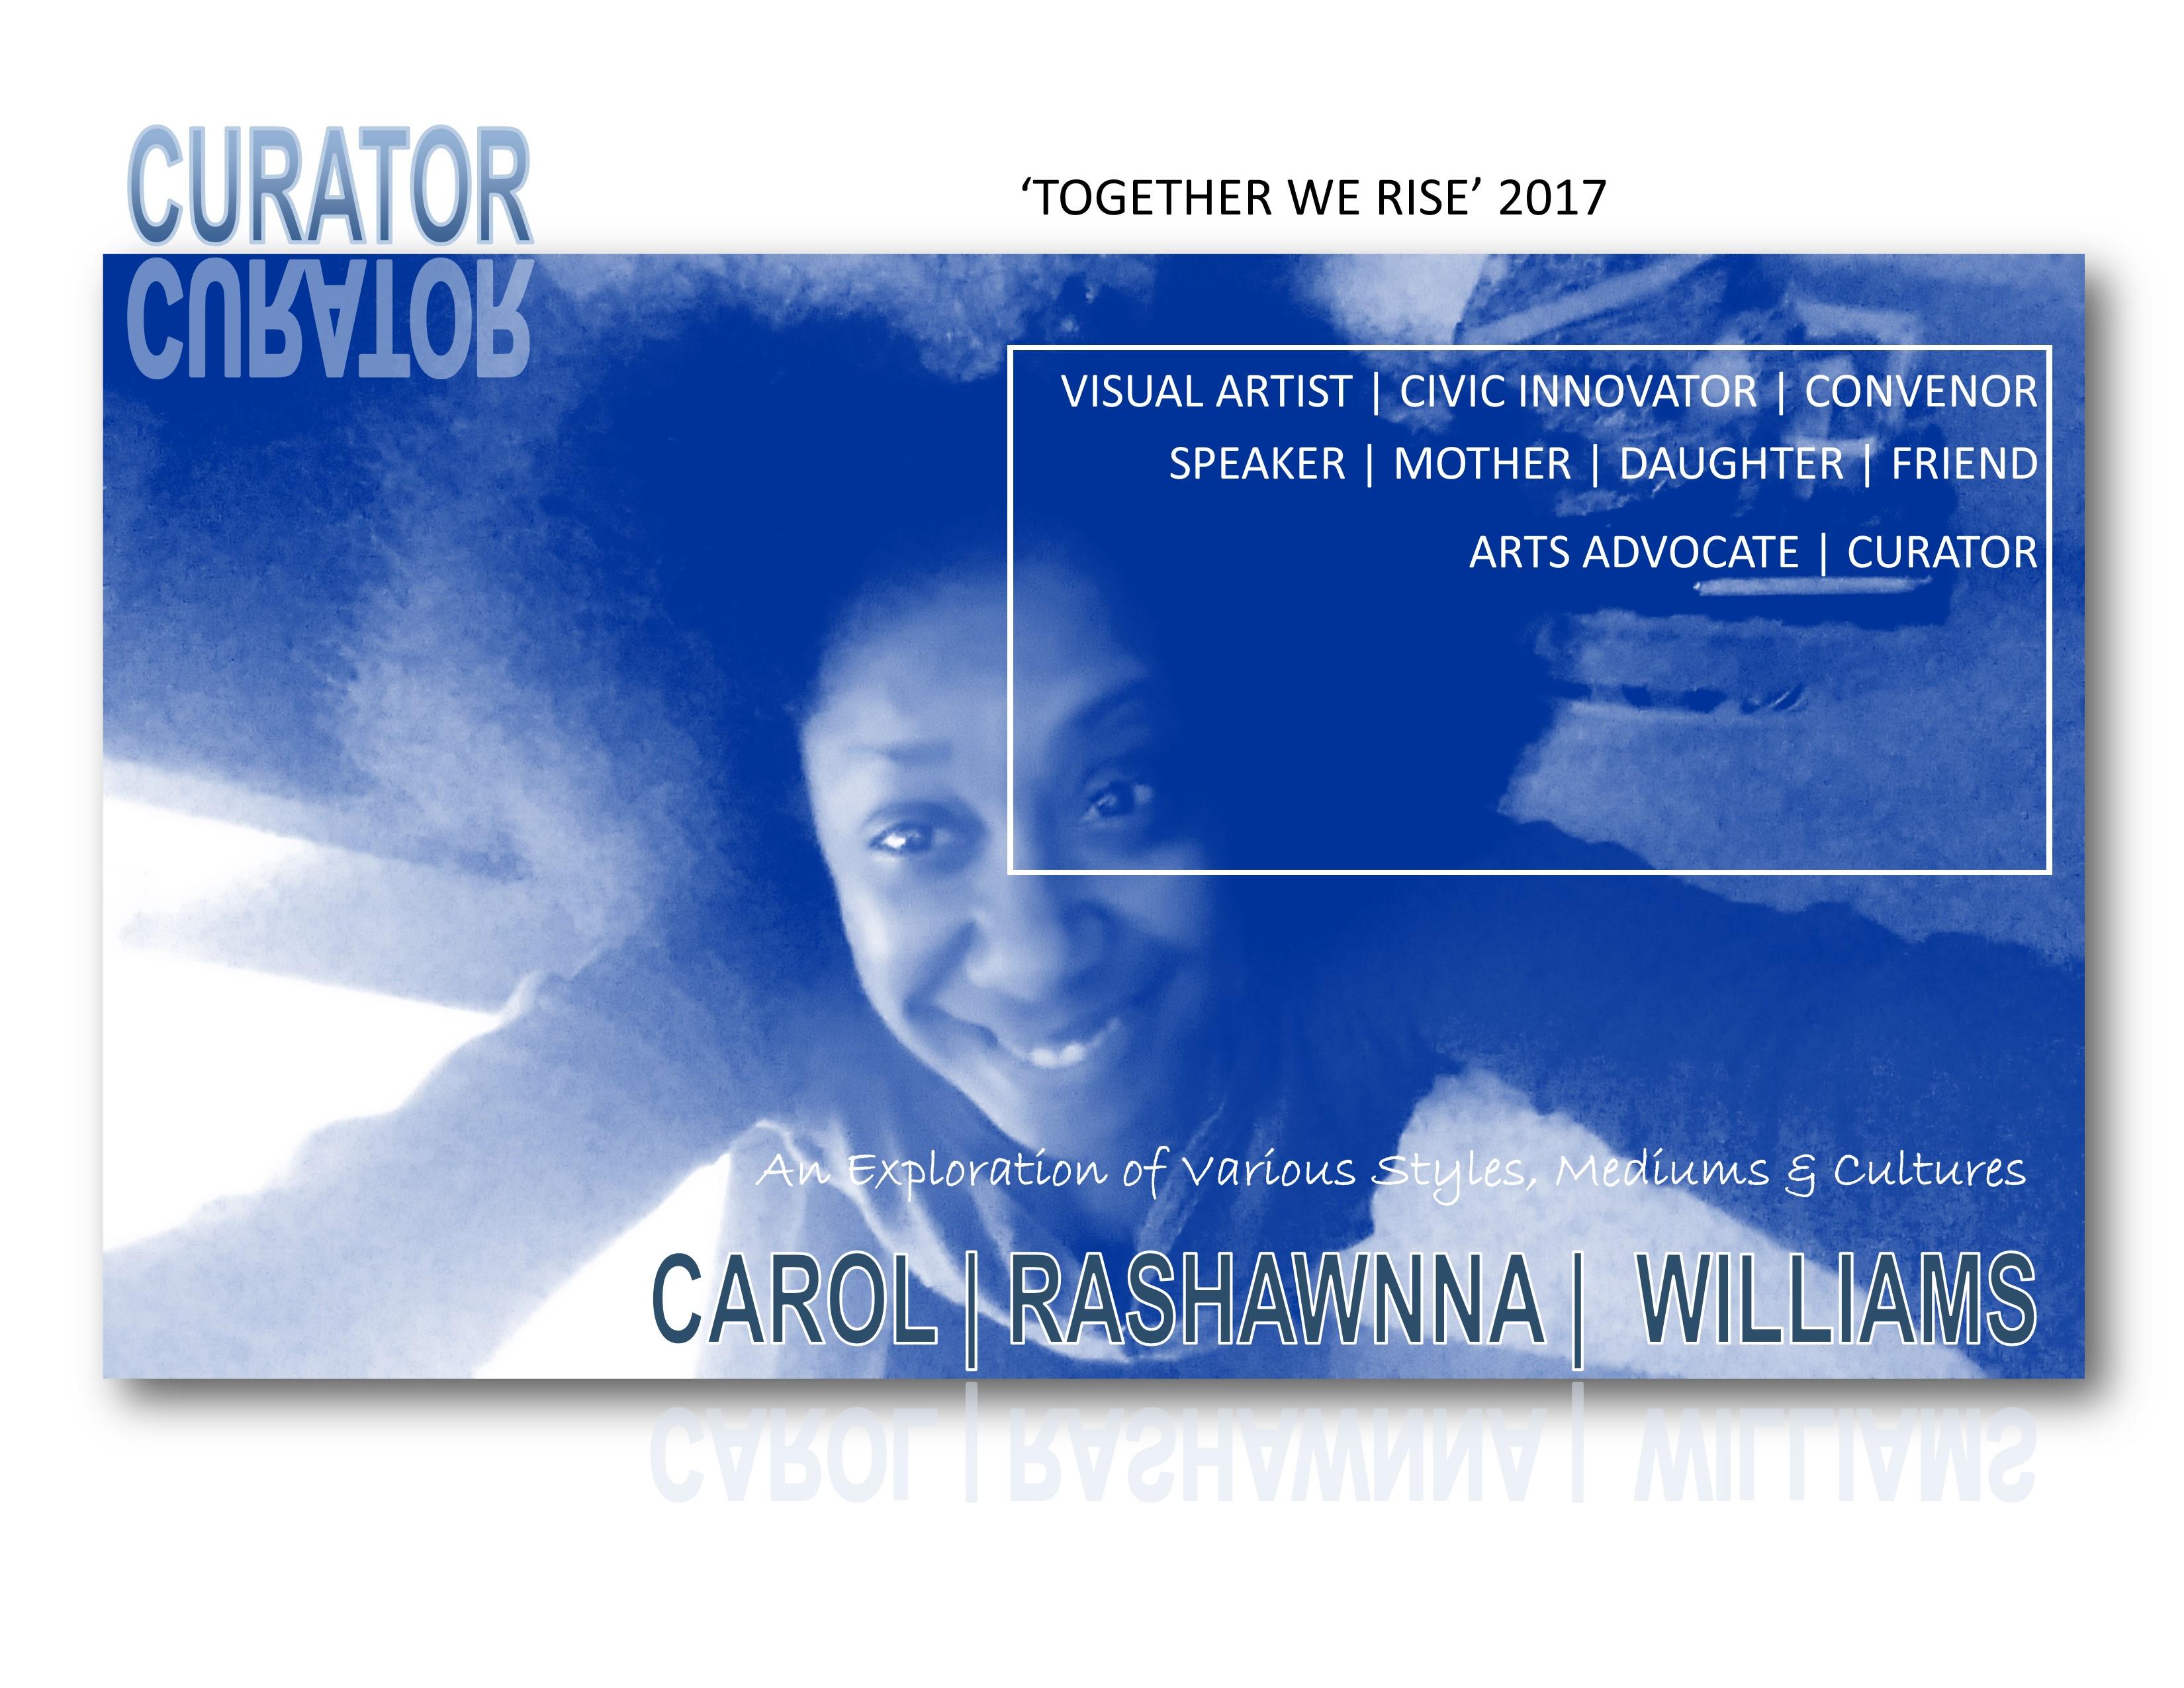 CRW Curator